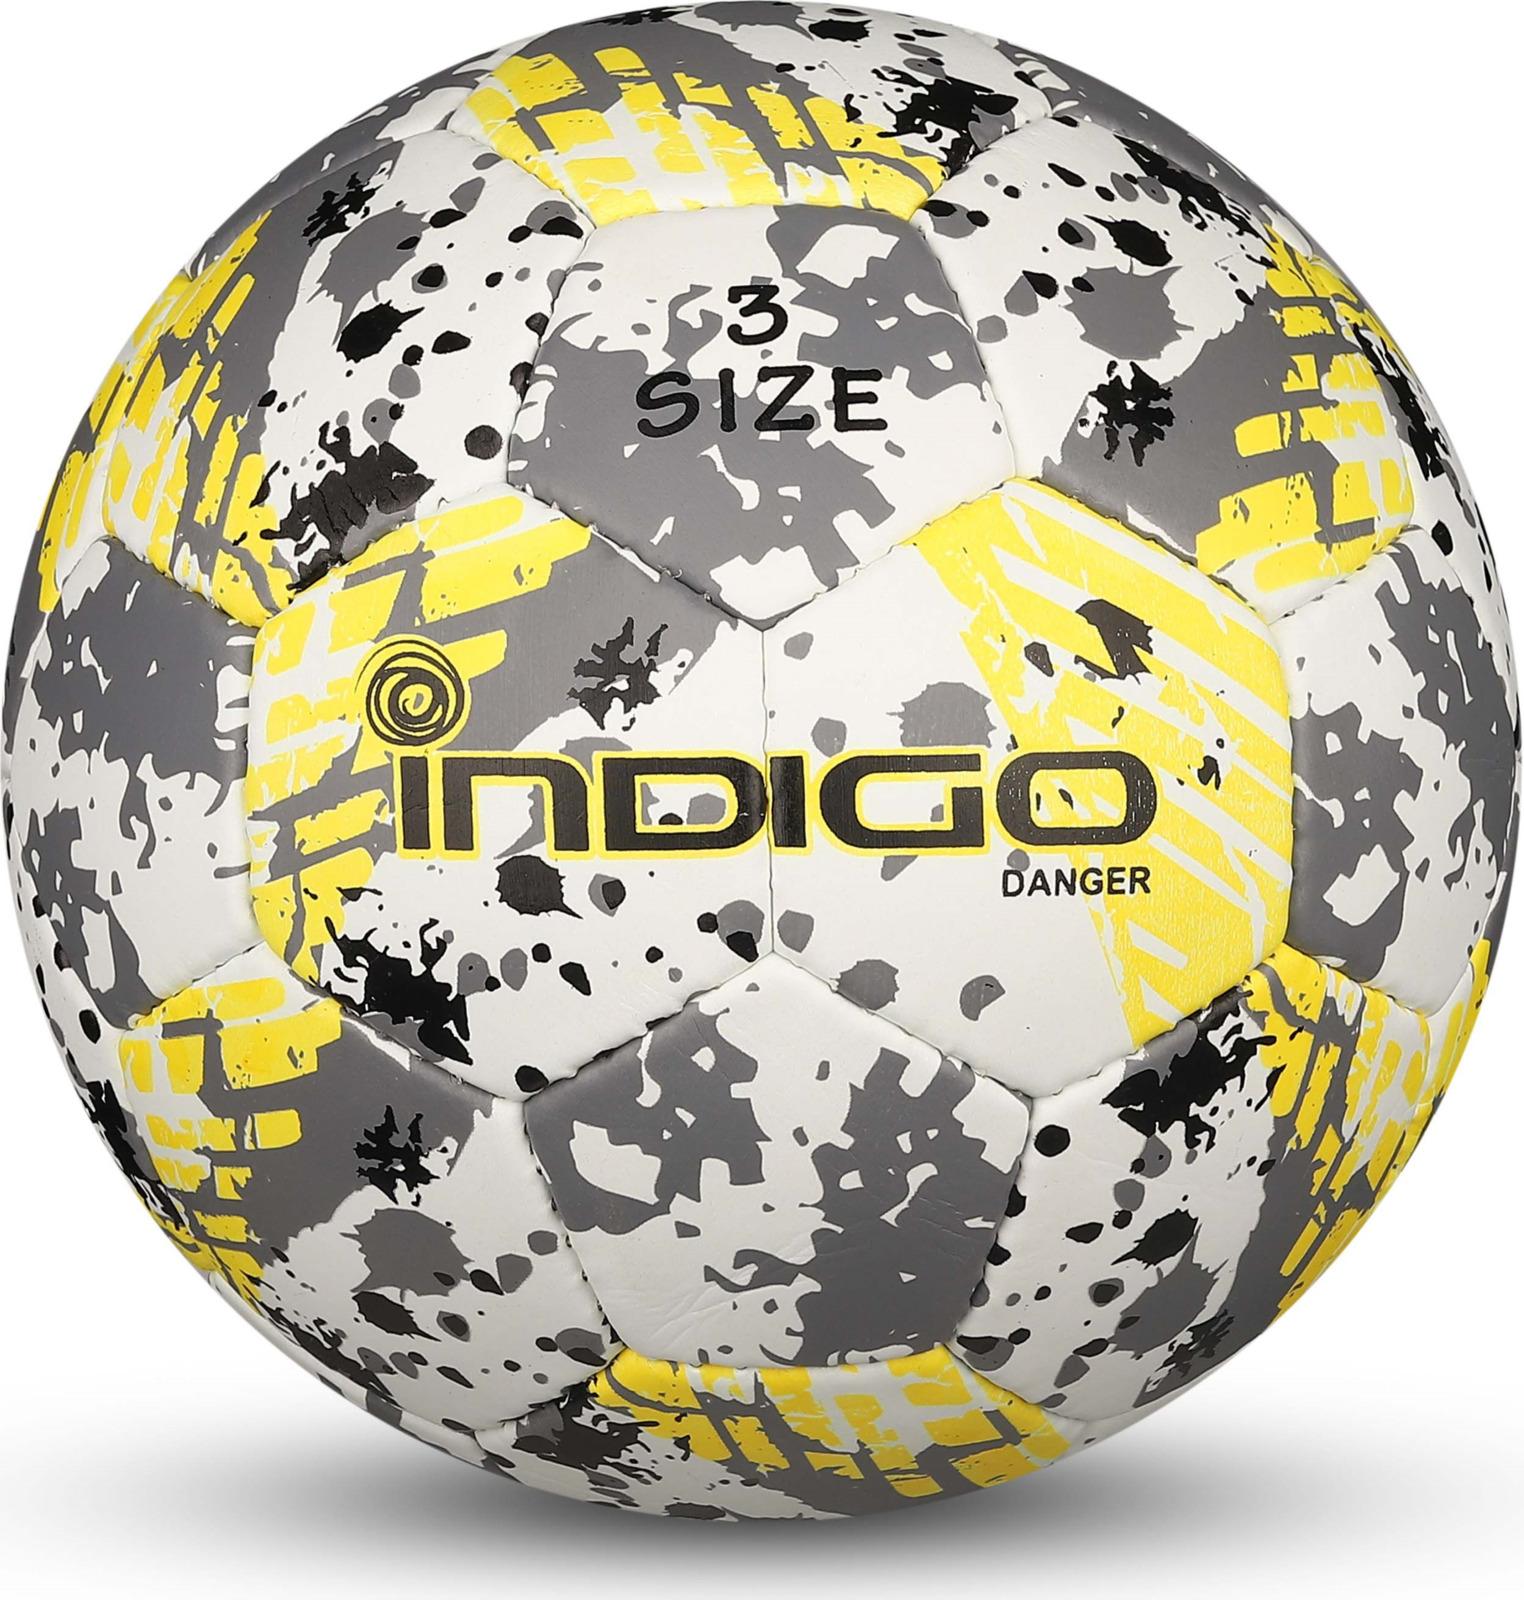 Мяч футбольный Indigo Danger, IN032, белый, серый, желтый, размер 3 мяч футбольный adidas real madrid fbl cw4156 белый серый размер 3